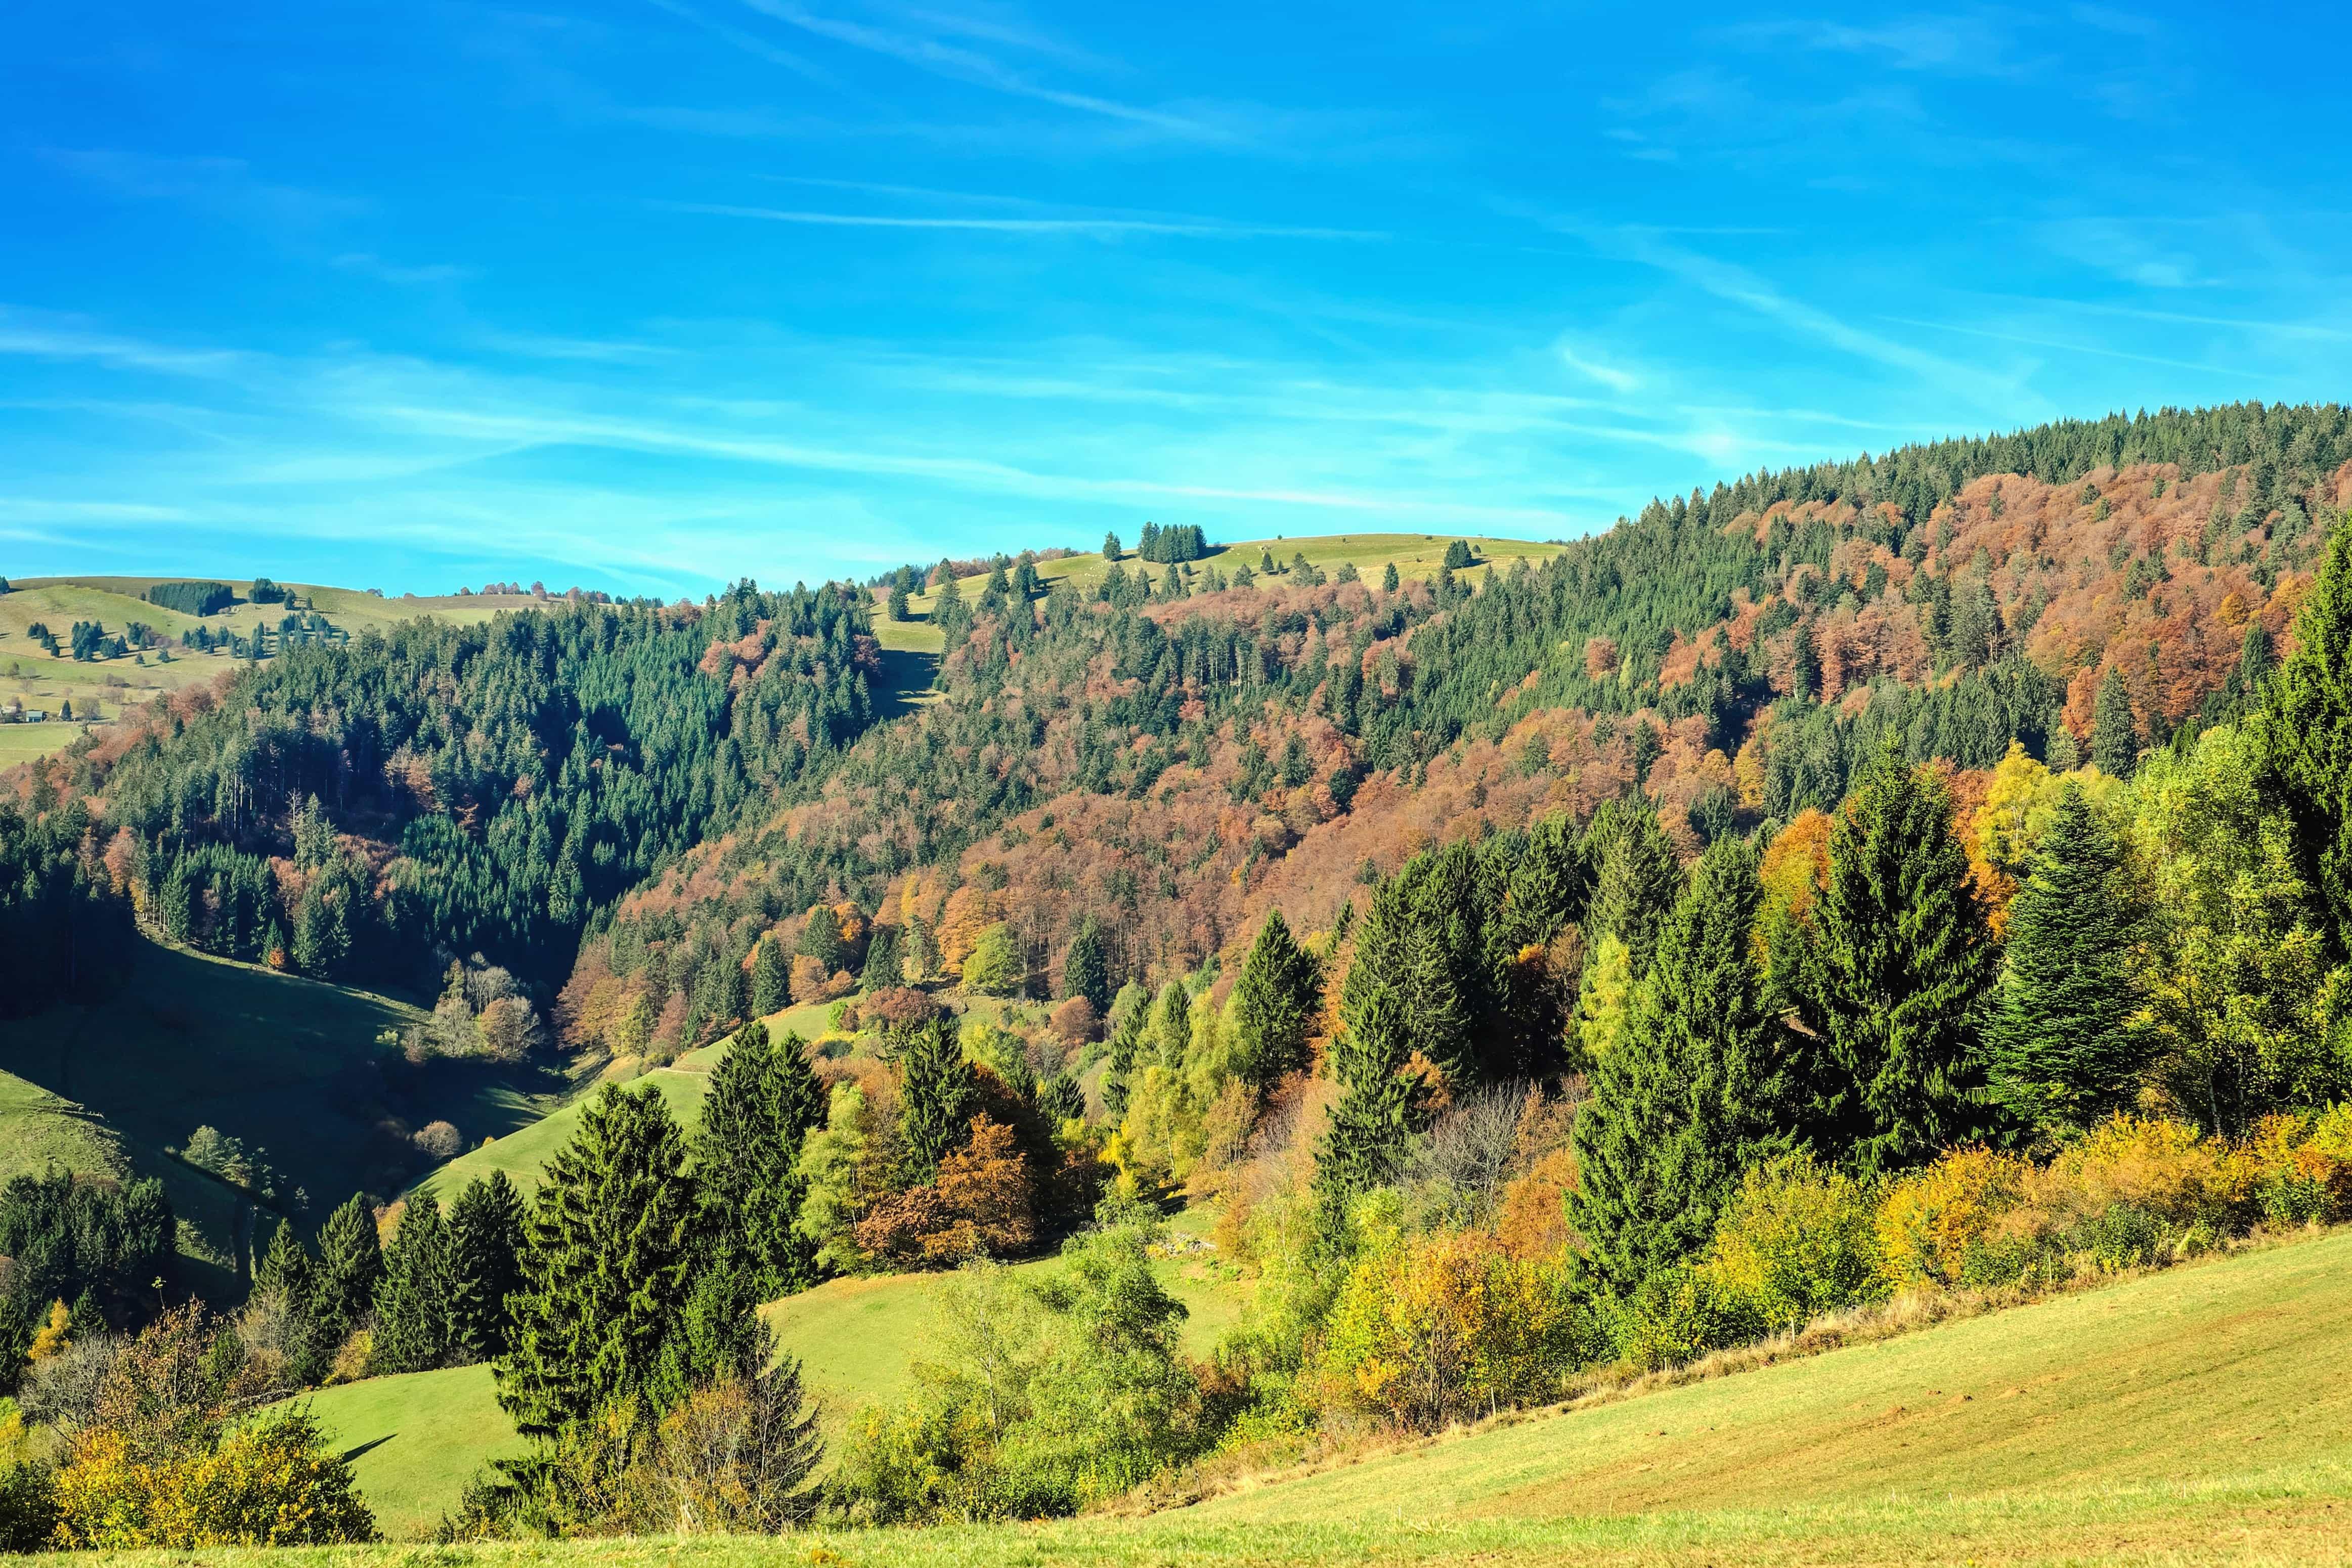 Foto gratis paesaggio natura albero montagna cielo for Disegni colorati paesaggi